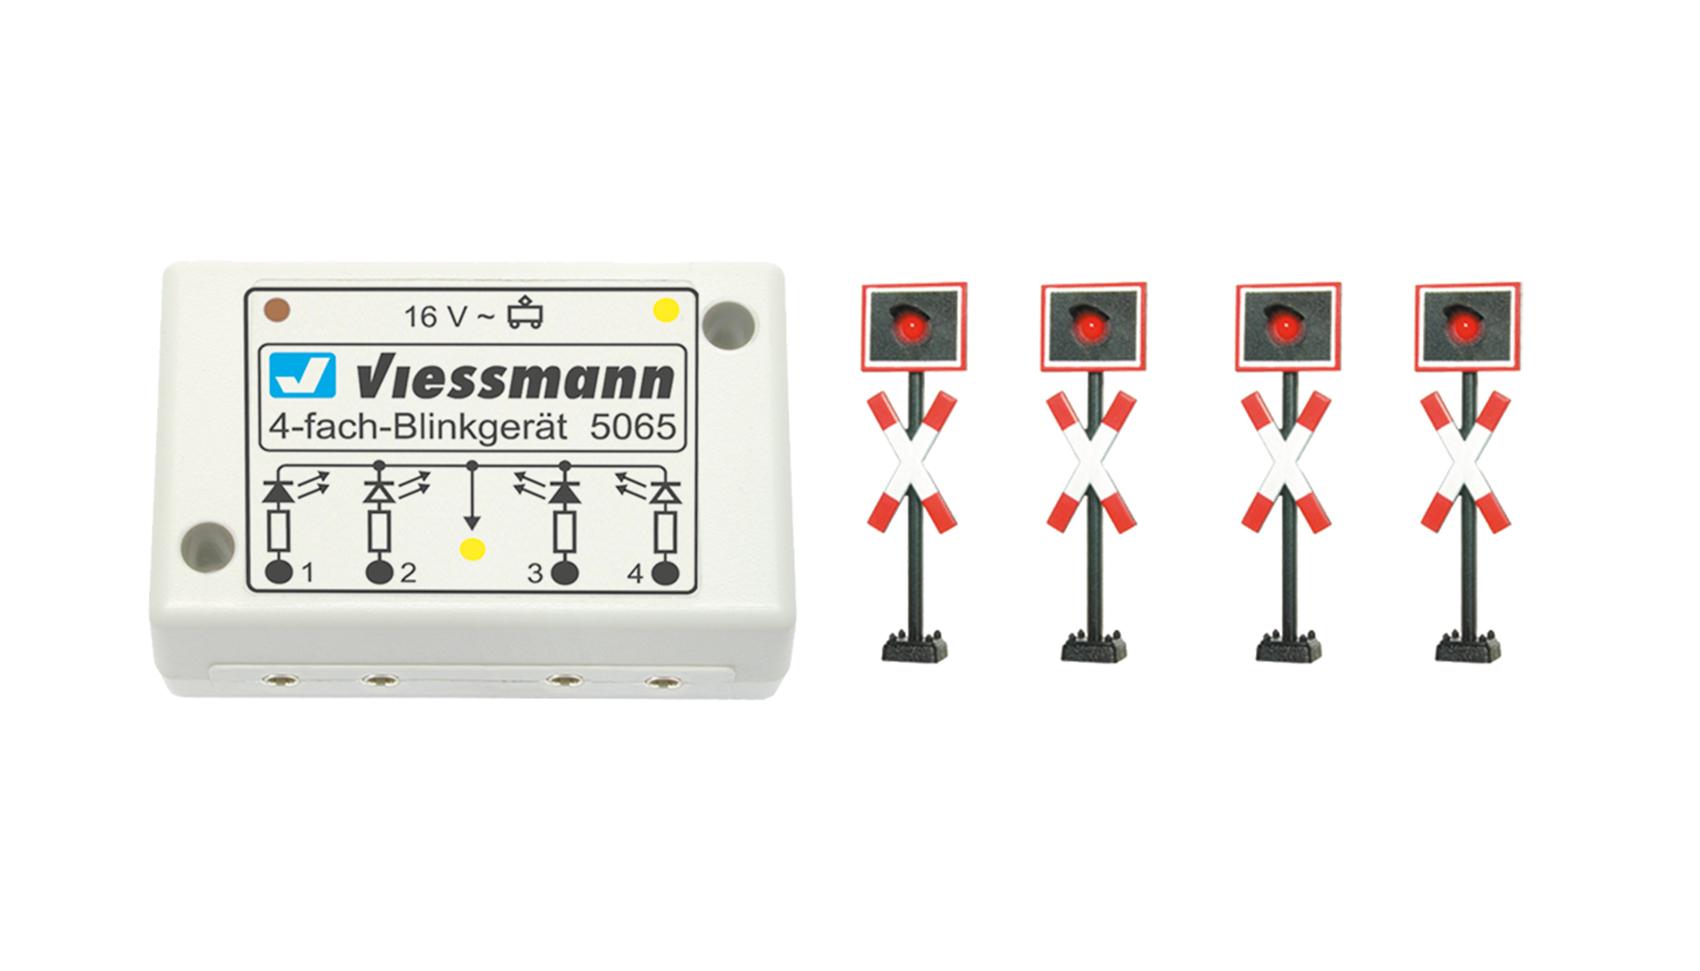 Viessmann 5800 <br/>Andreaskreuze, mit Blink-Elektronik, 4 Stück